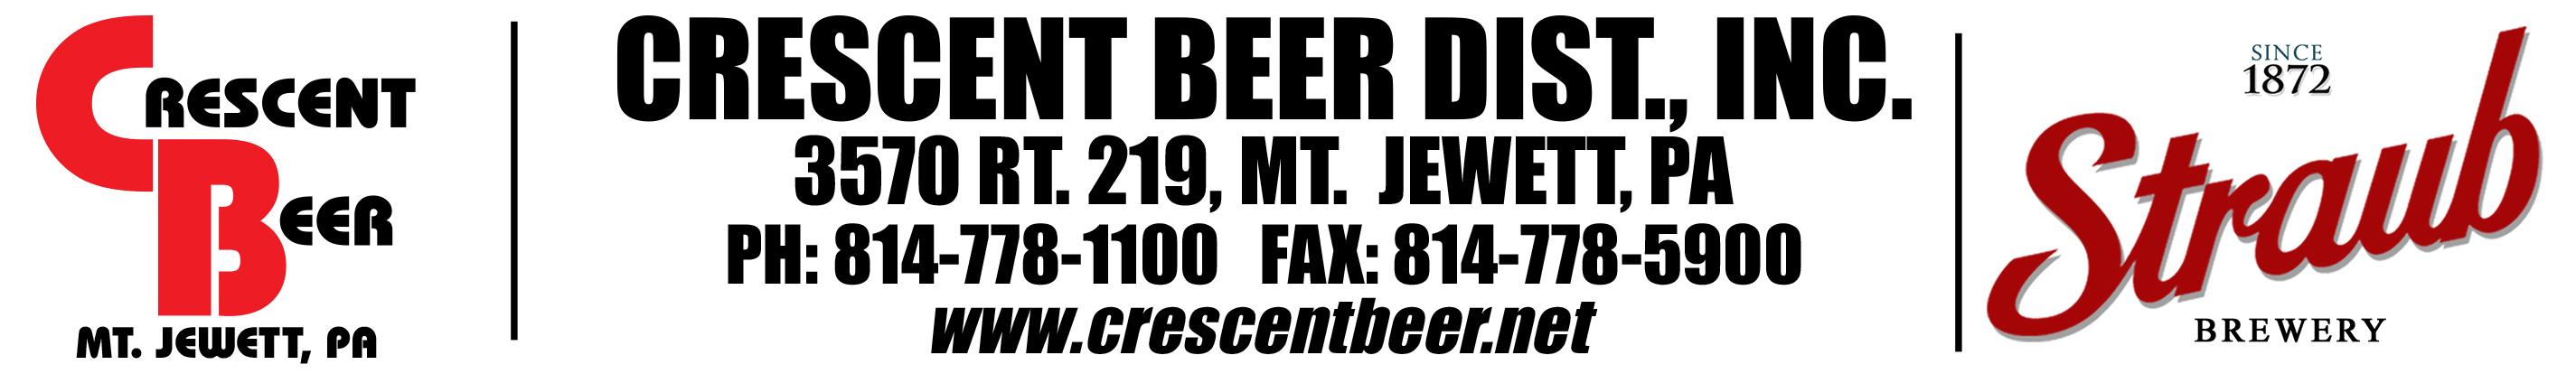 Straub Beer Local Distribution